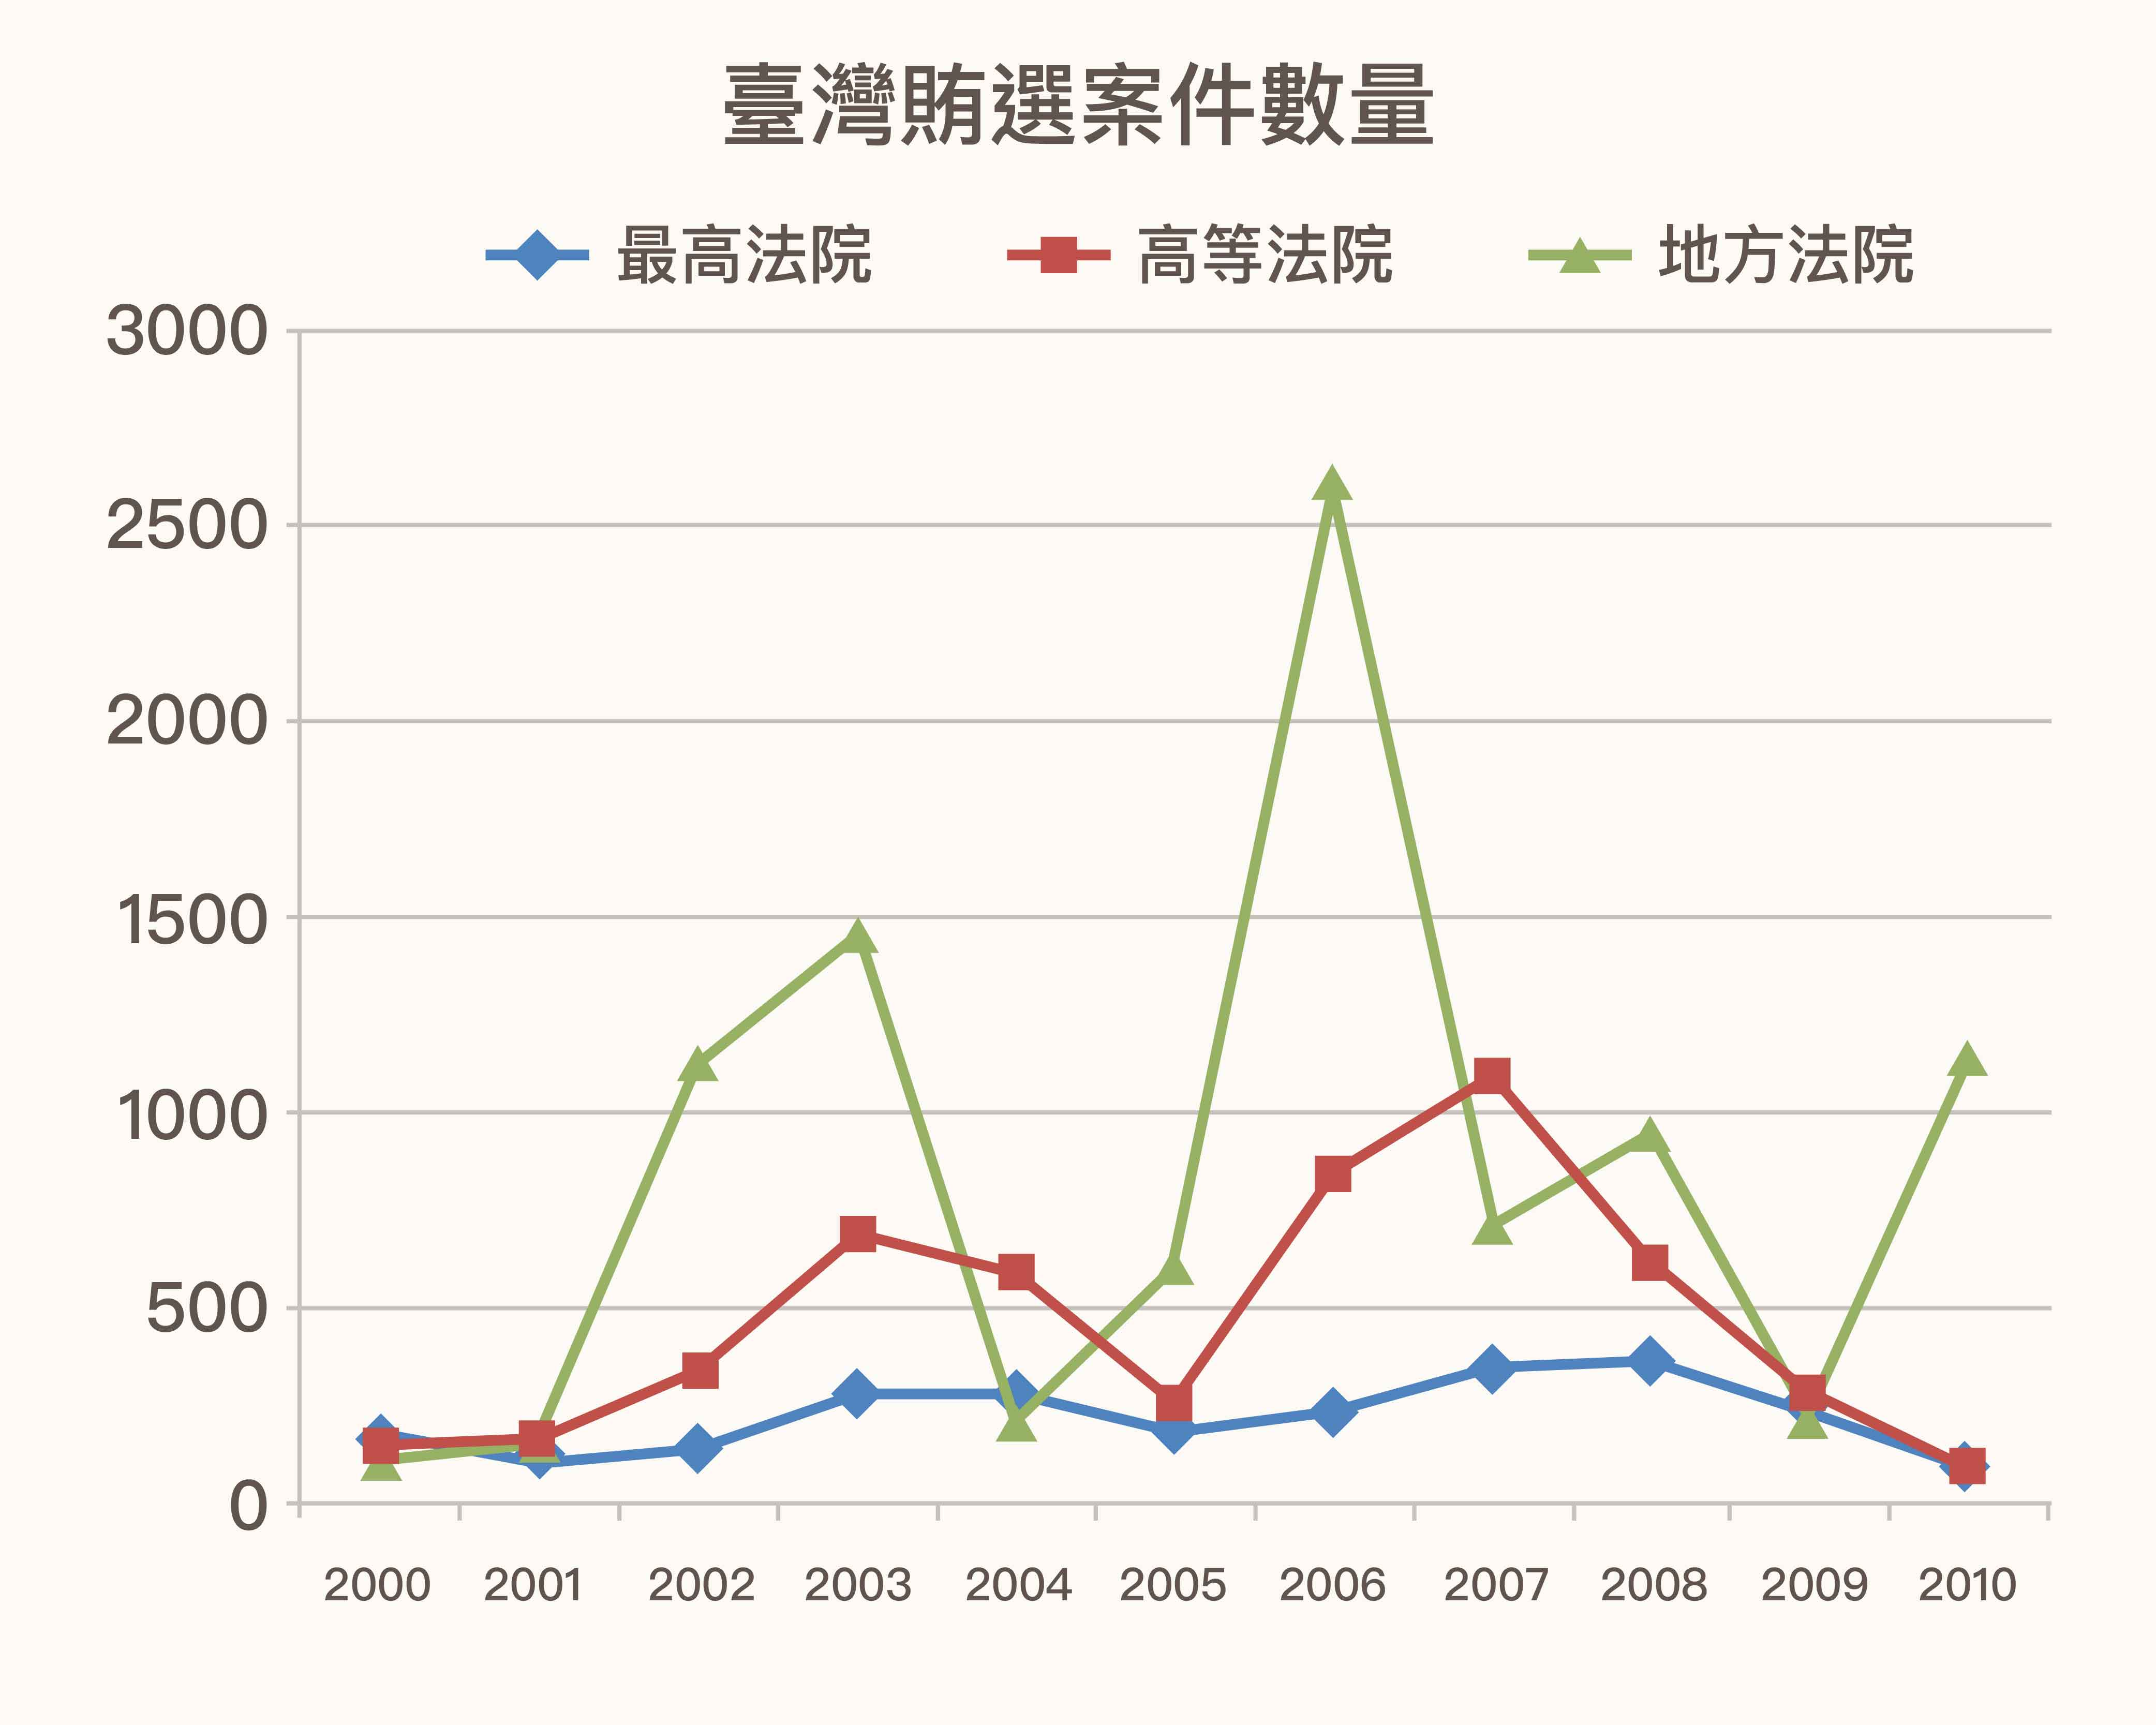 為什麼要研究賄選?此圖顯示,賄選風氣猖獗是臺灣選舉政治的一大弊端。圖│Charge Me if You Can: Assessing Political Biases in Votebuying Verdicts in Democratic Taiwan (2000–2010)